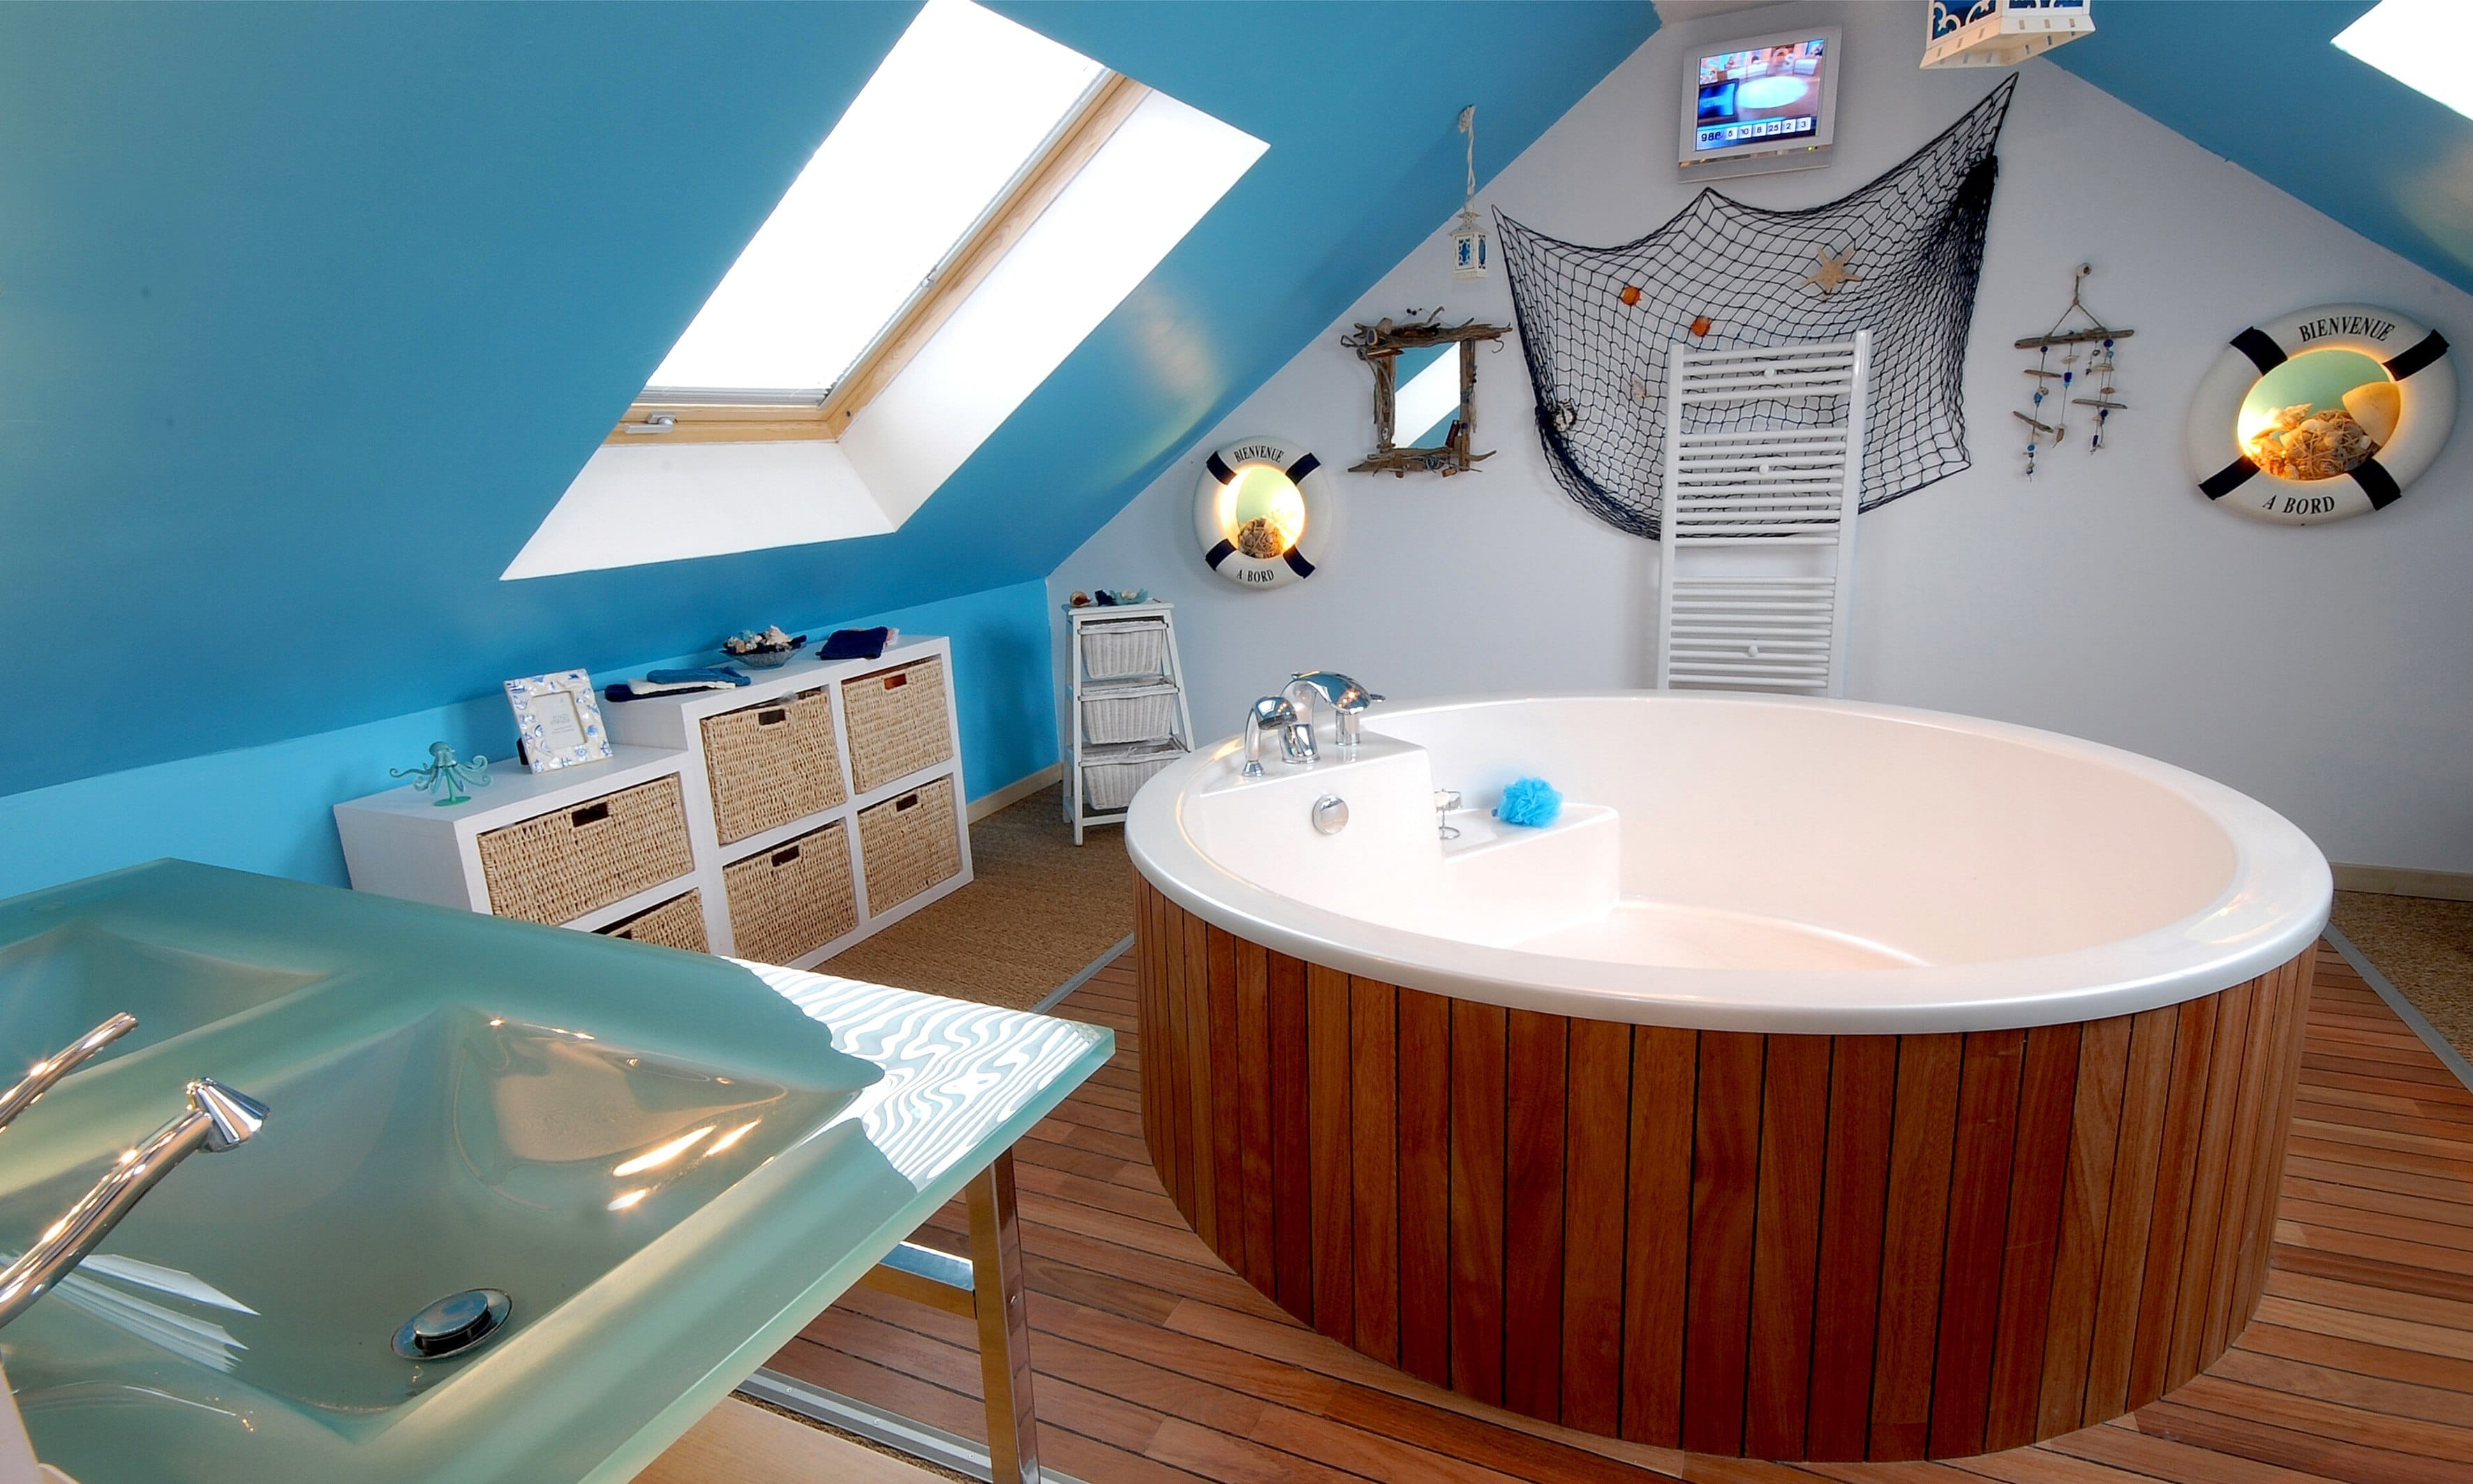 spa dans salle de bain